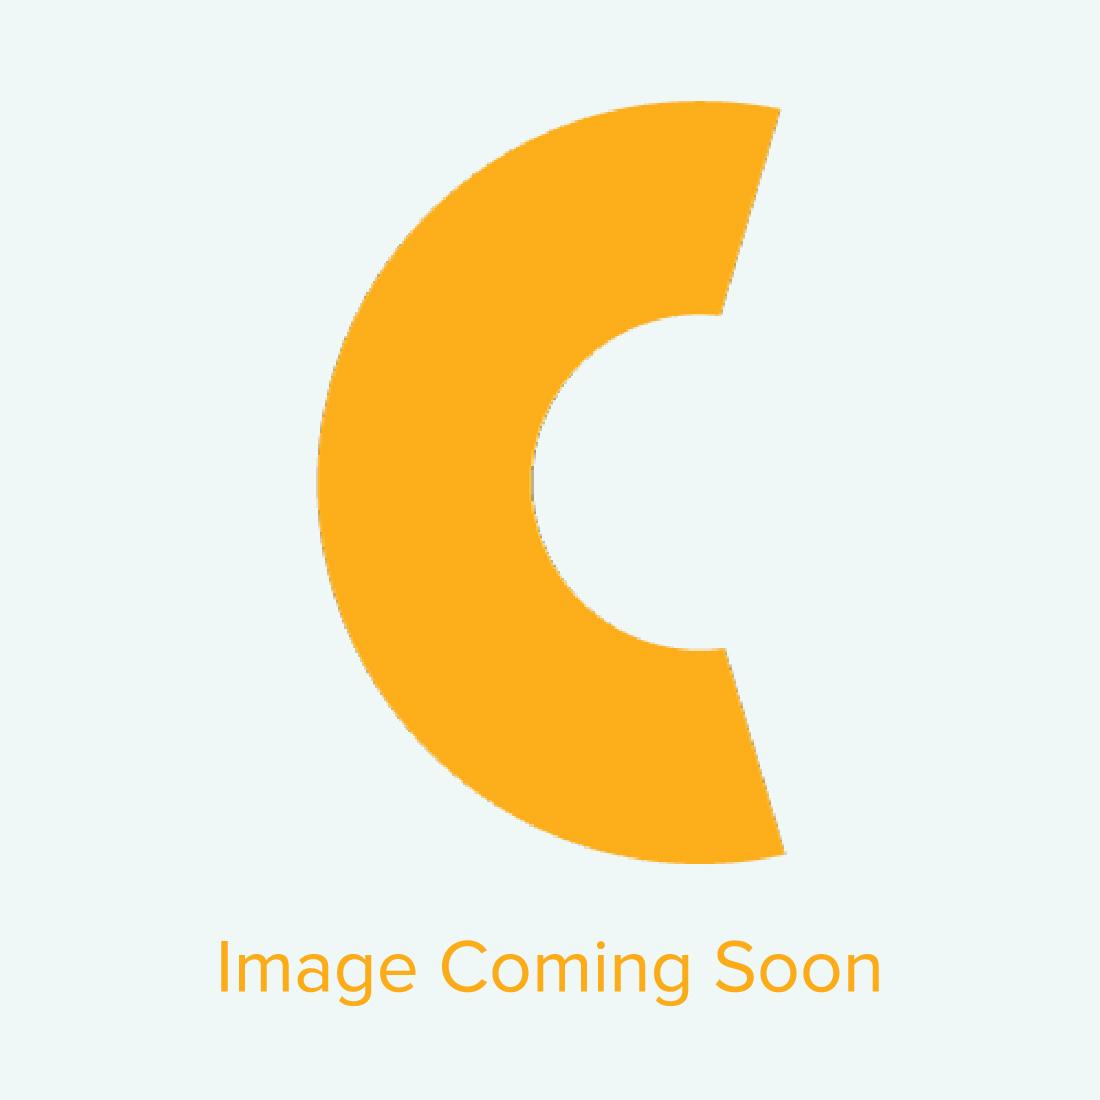 "Oval Sublimation Insert for Bezel Pendant – 1"" x 1.5"" (25/case)"